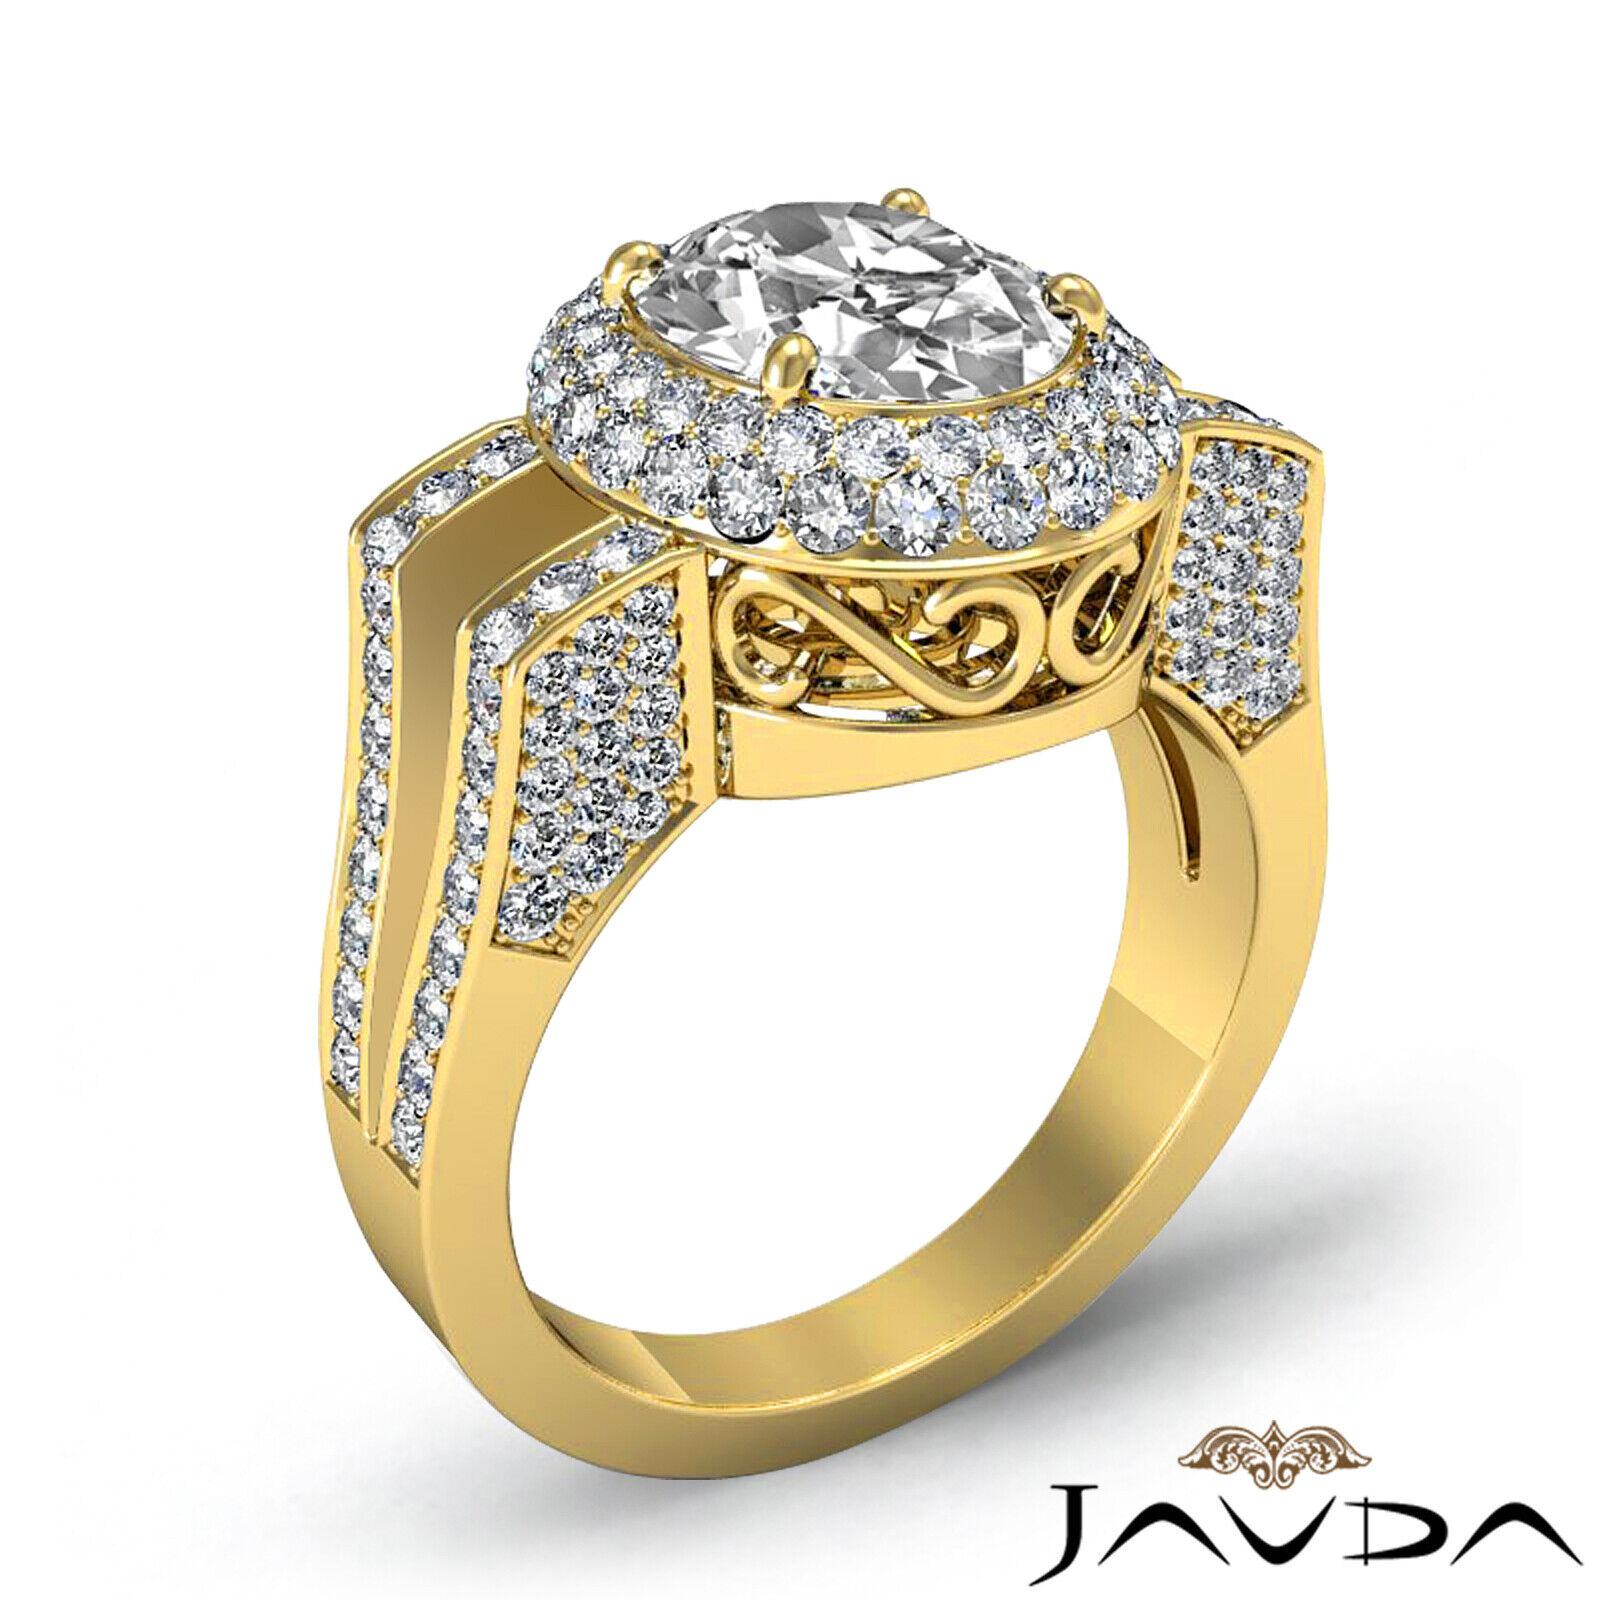 1.9ctw Gala Halo Split Shank Oval Diamond Engagement Ring GIA E-VS2 White Gold 8